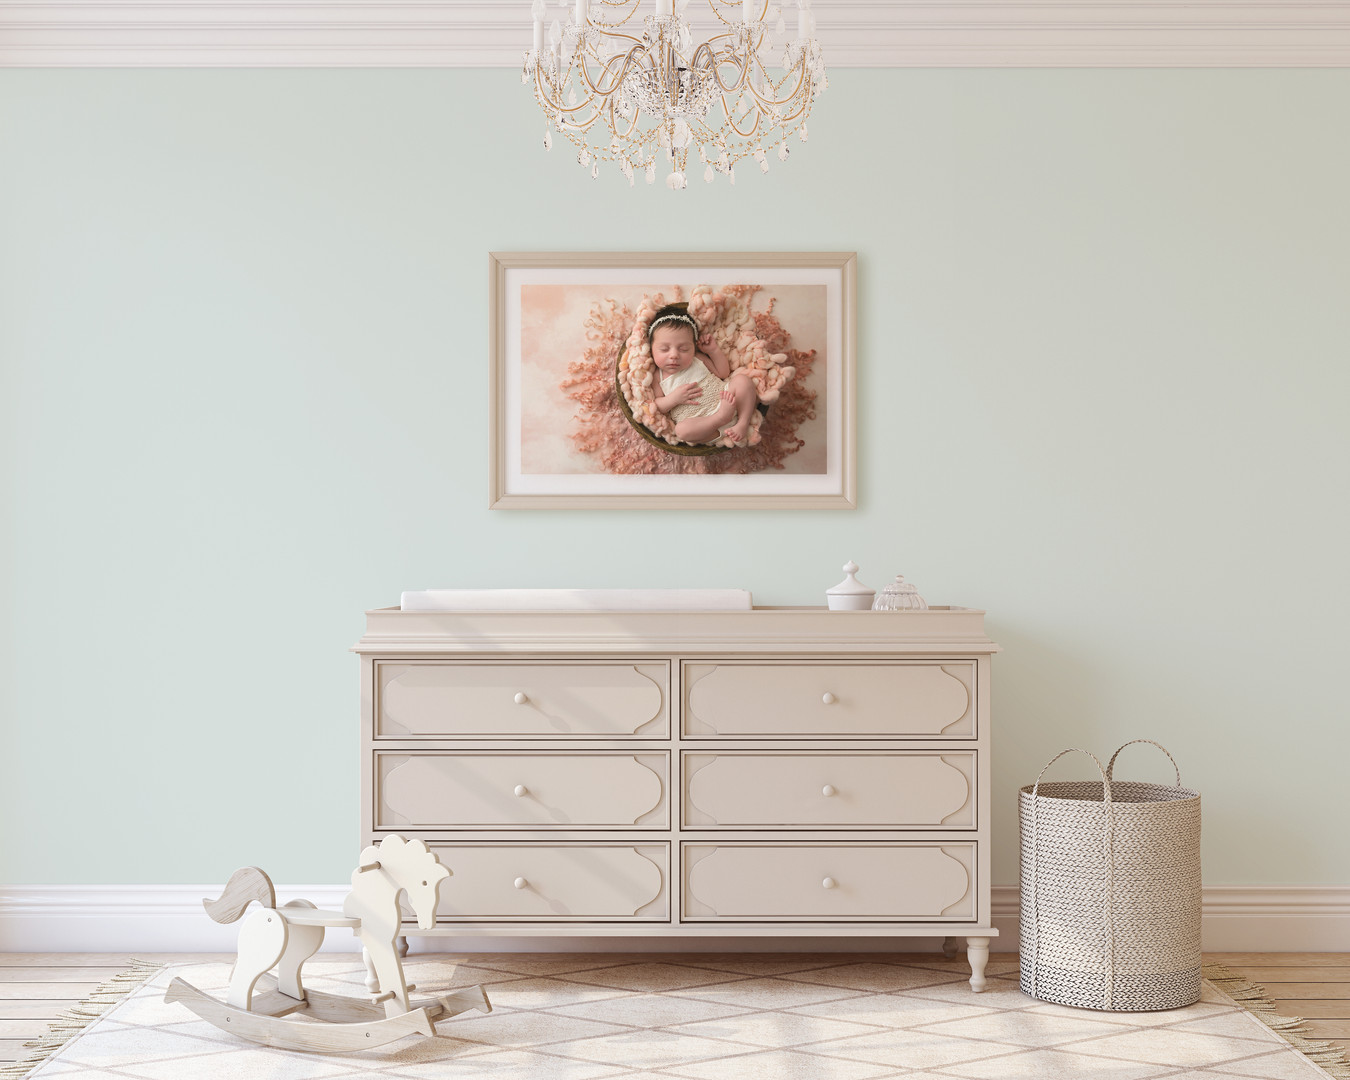 dresser-200501-123500.psd.jpg